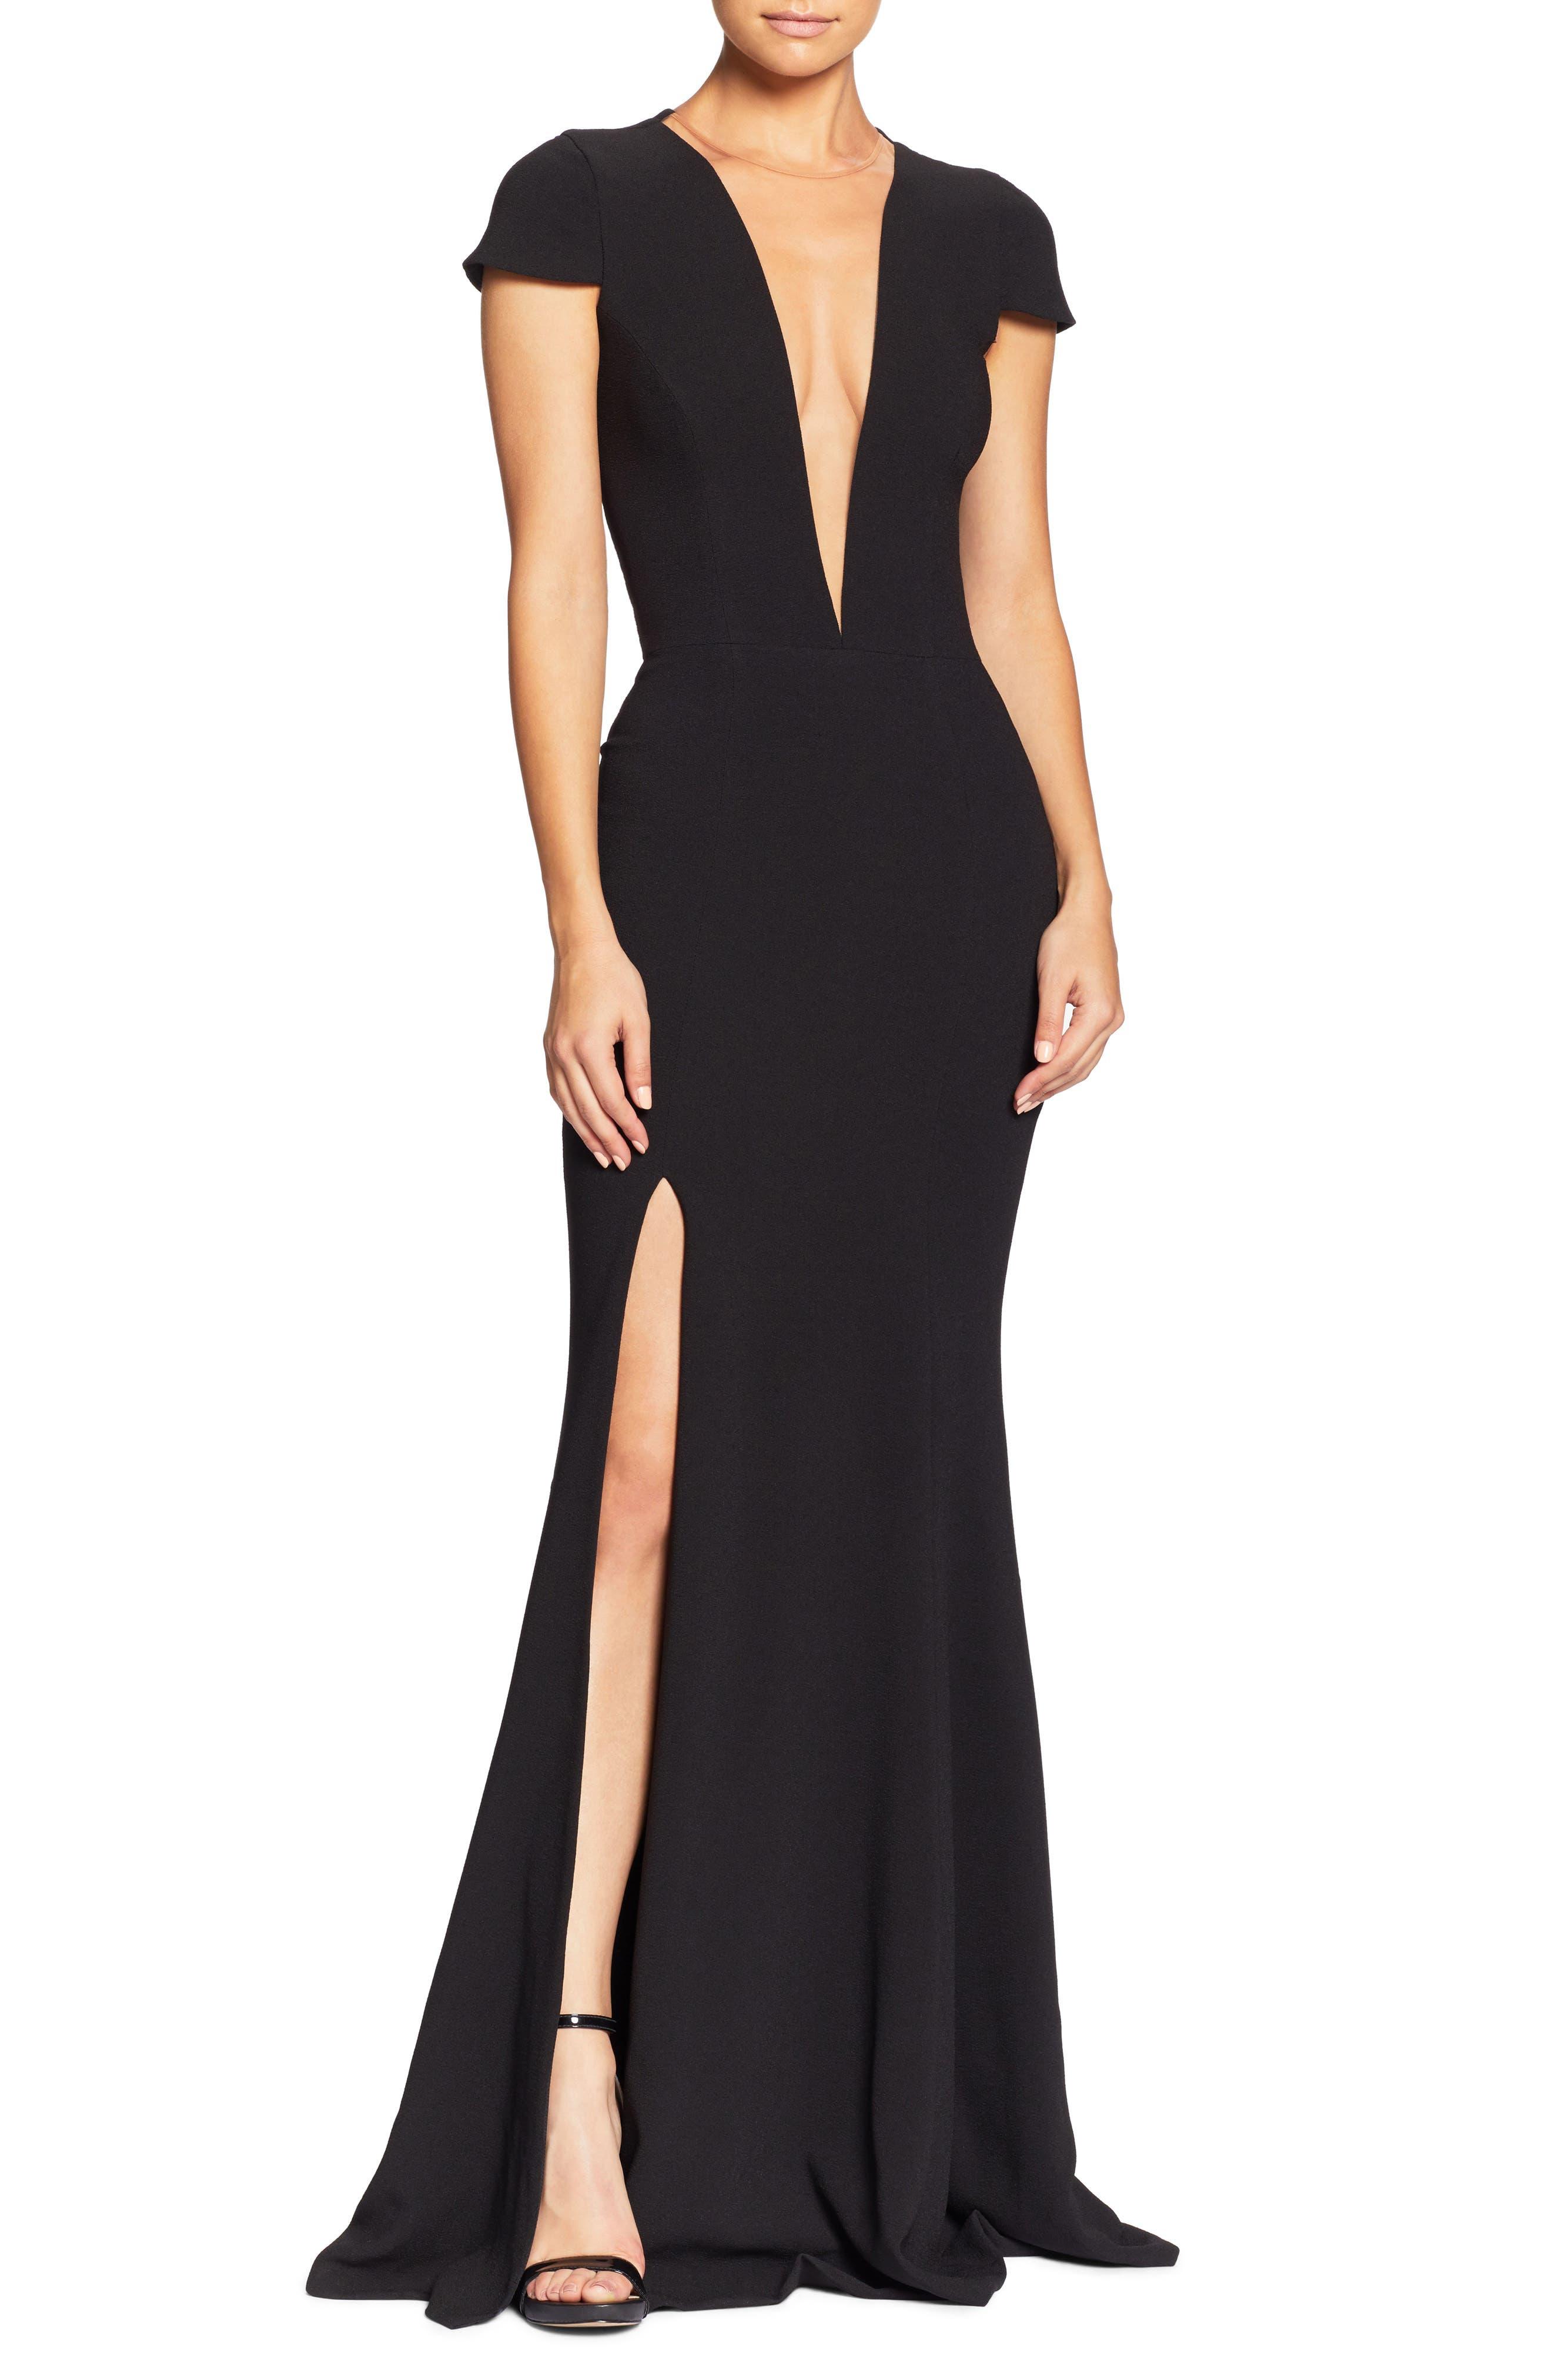 Fitted Black Long Formal Dresses